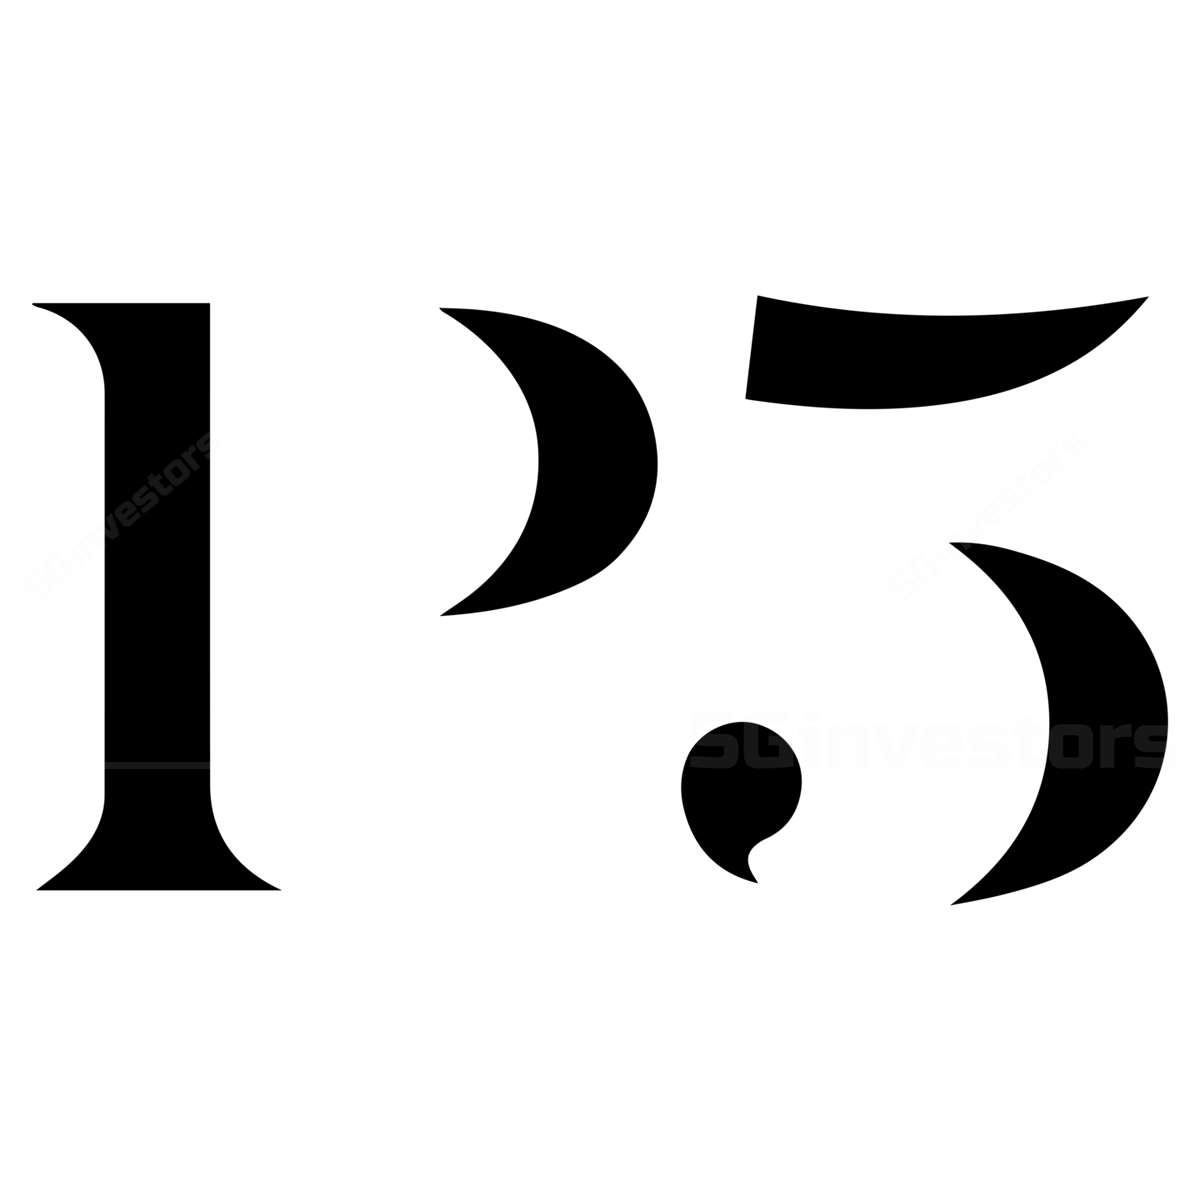 P5 CAPITAL HOLDINGS LTD. (SGX:5AI) @ SGinvestors.io